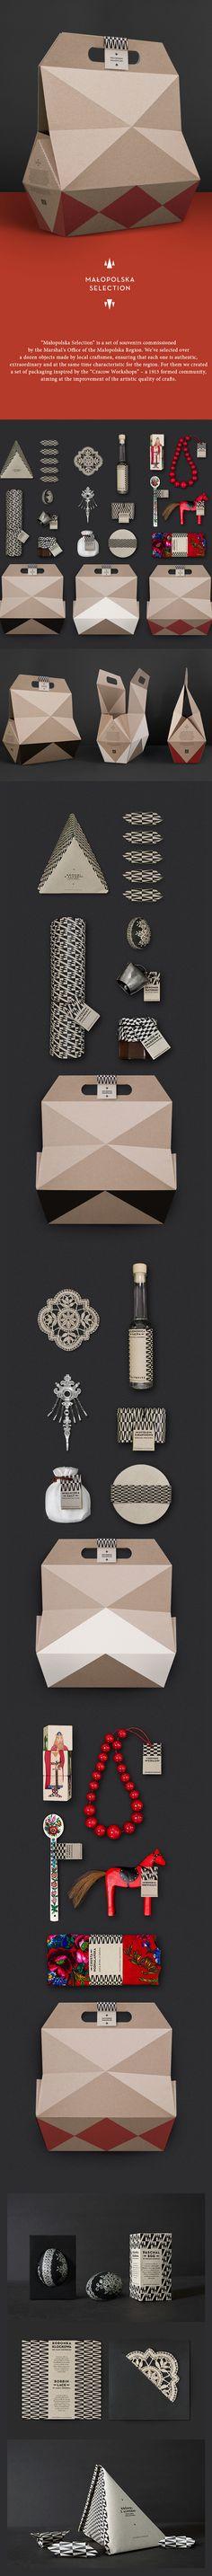 Packaging Design by Studio Otwarte